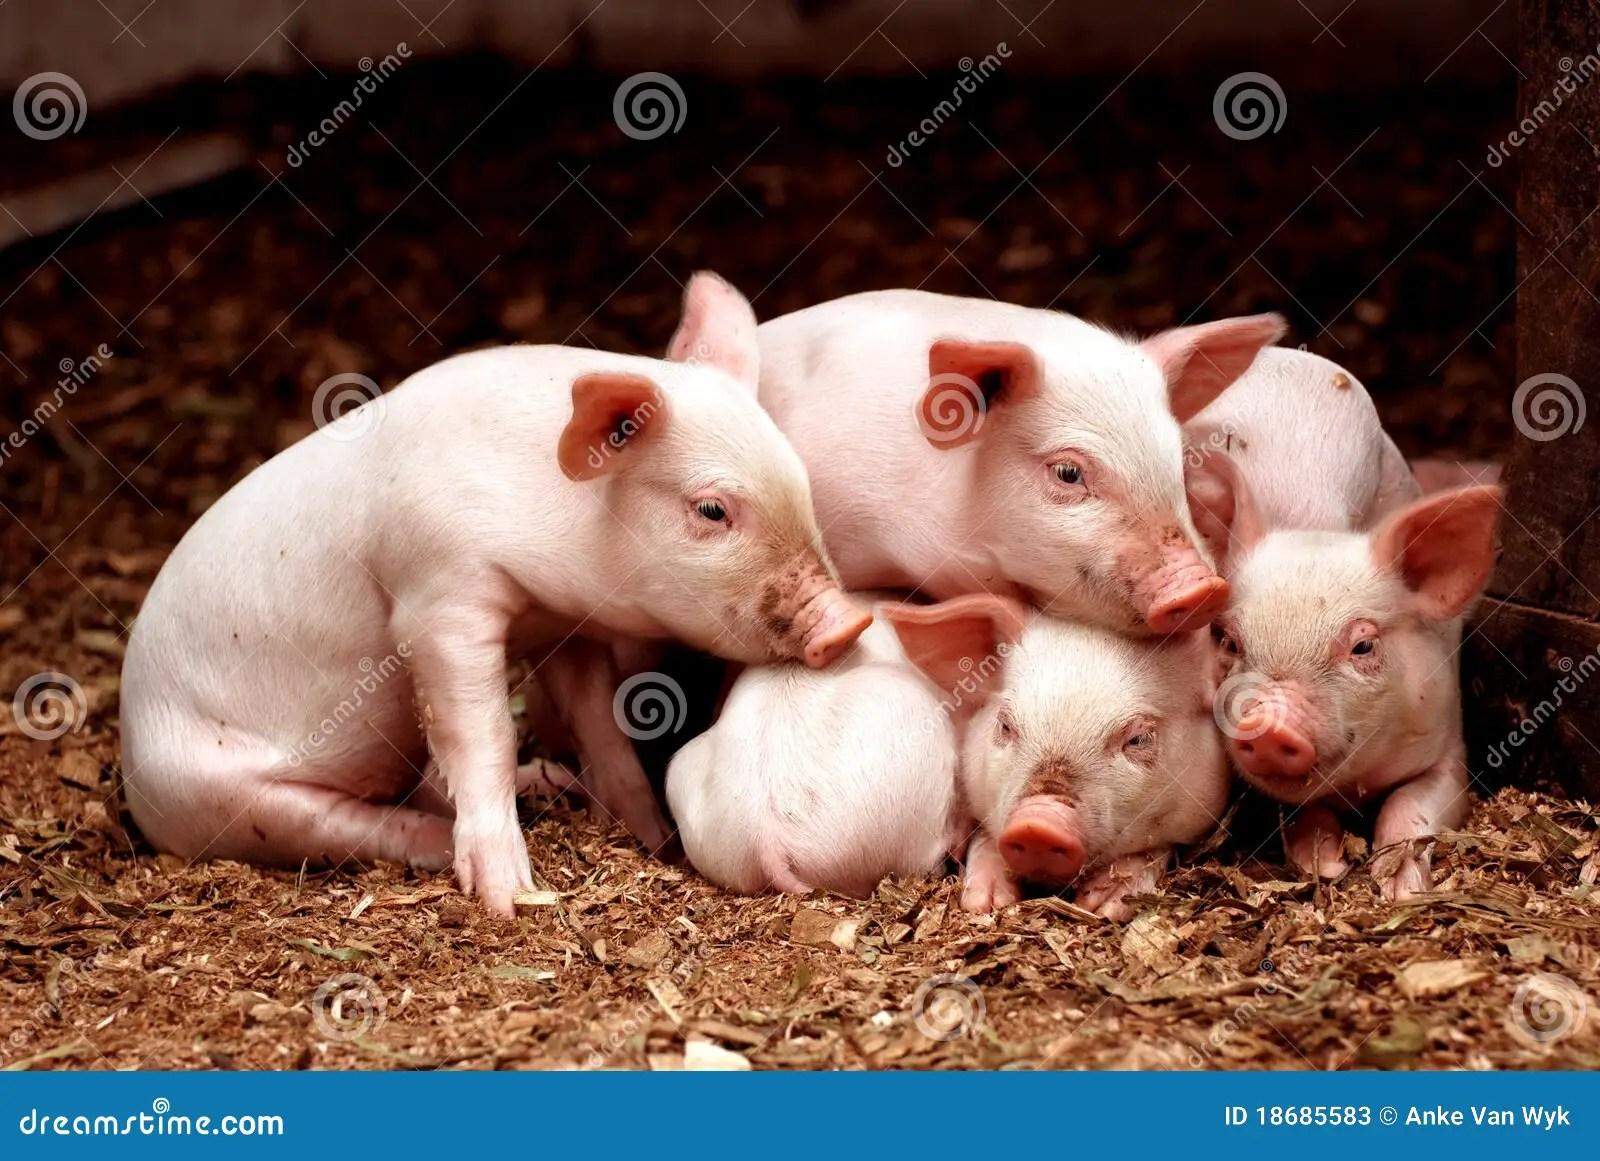 Little Piglets Stock Photos  Image 18685583